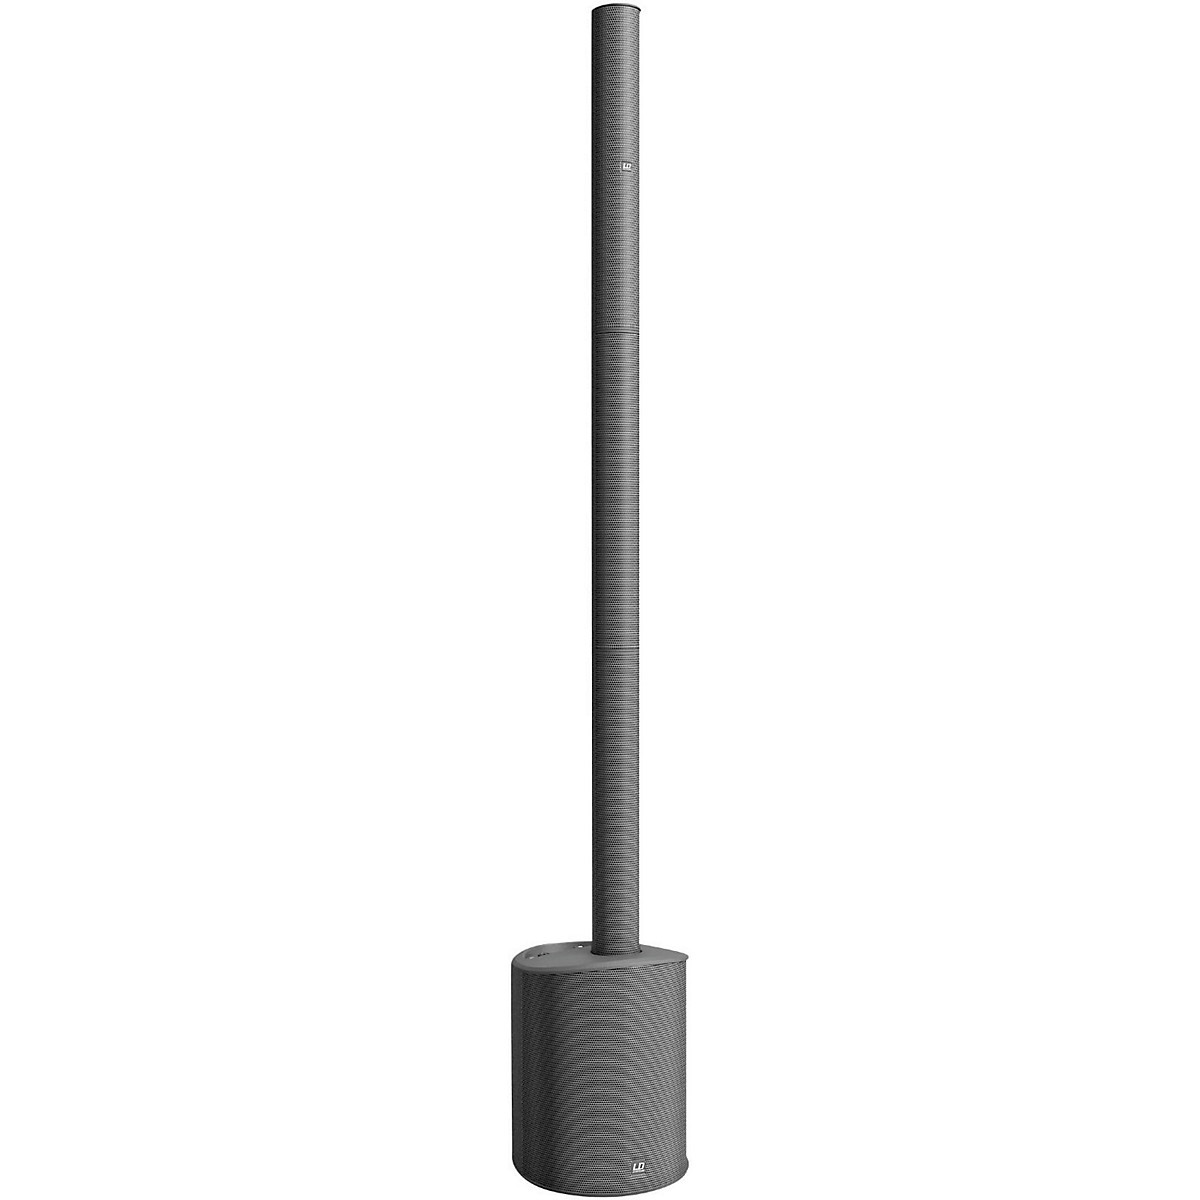 LD Systems MAUI 5 Ultra Portable Column PA System